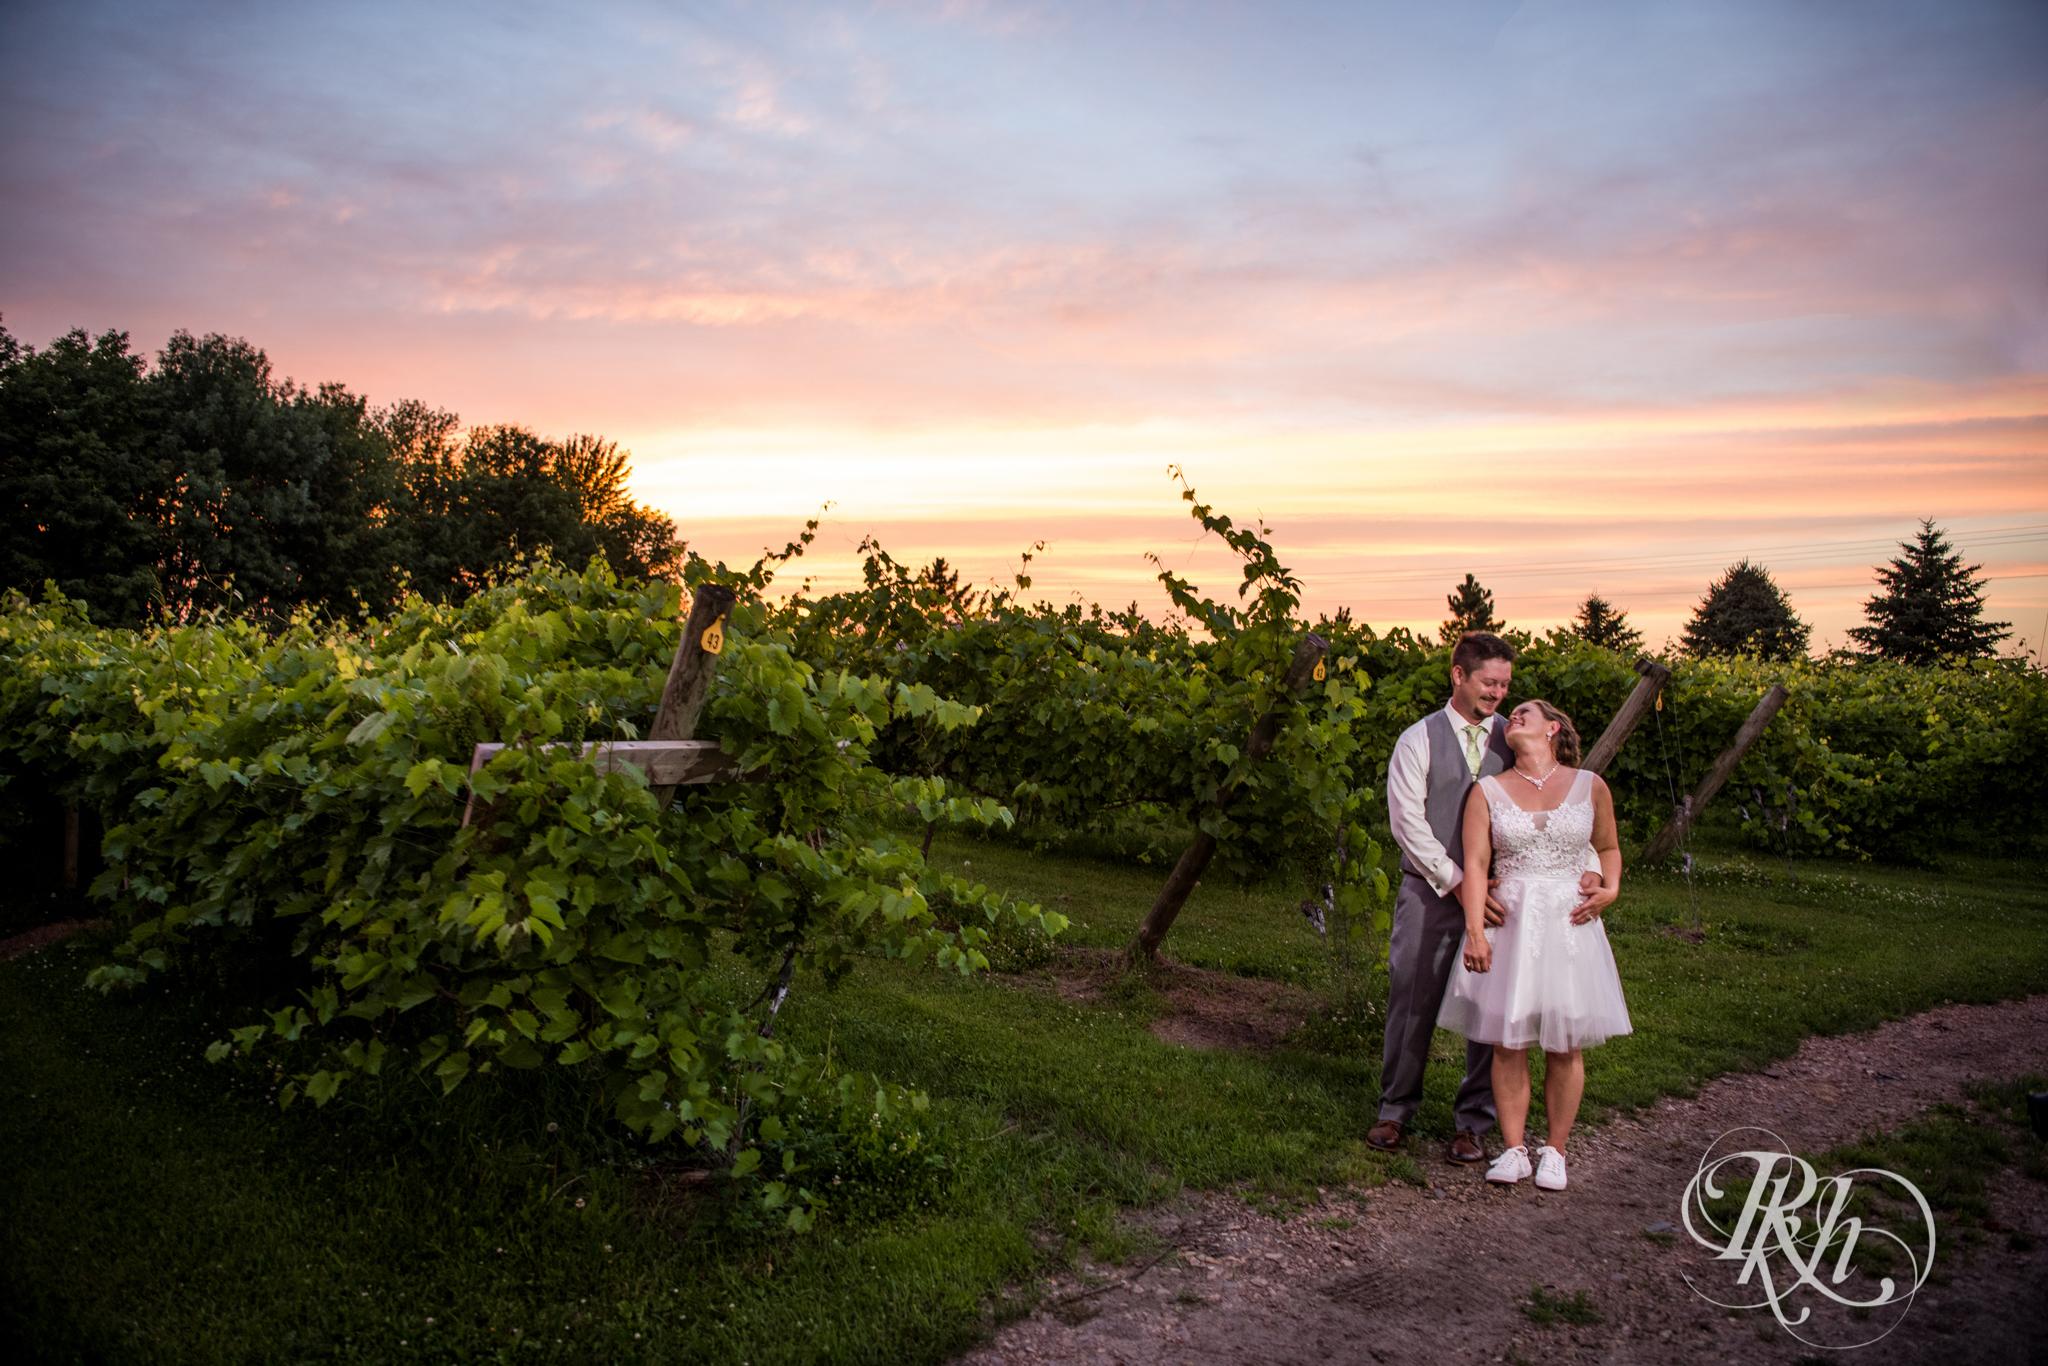 Ally & Nick - Minnesota Wedding Photography - Next Chapter Winery - RKH Images - Blog (55 of 57).jpg